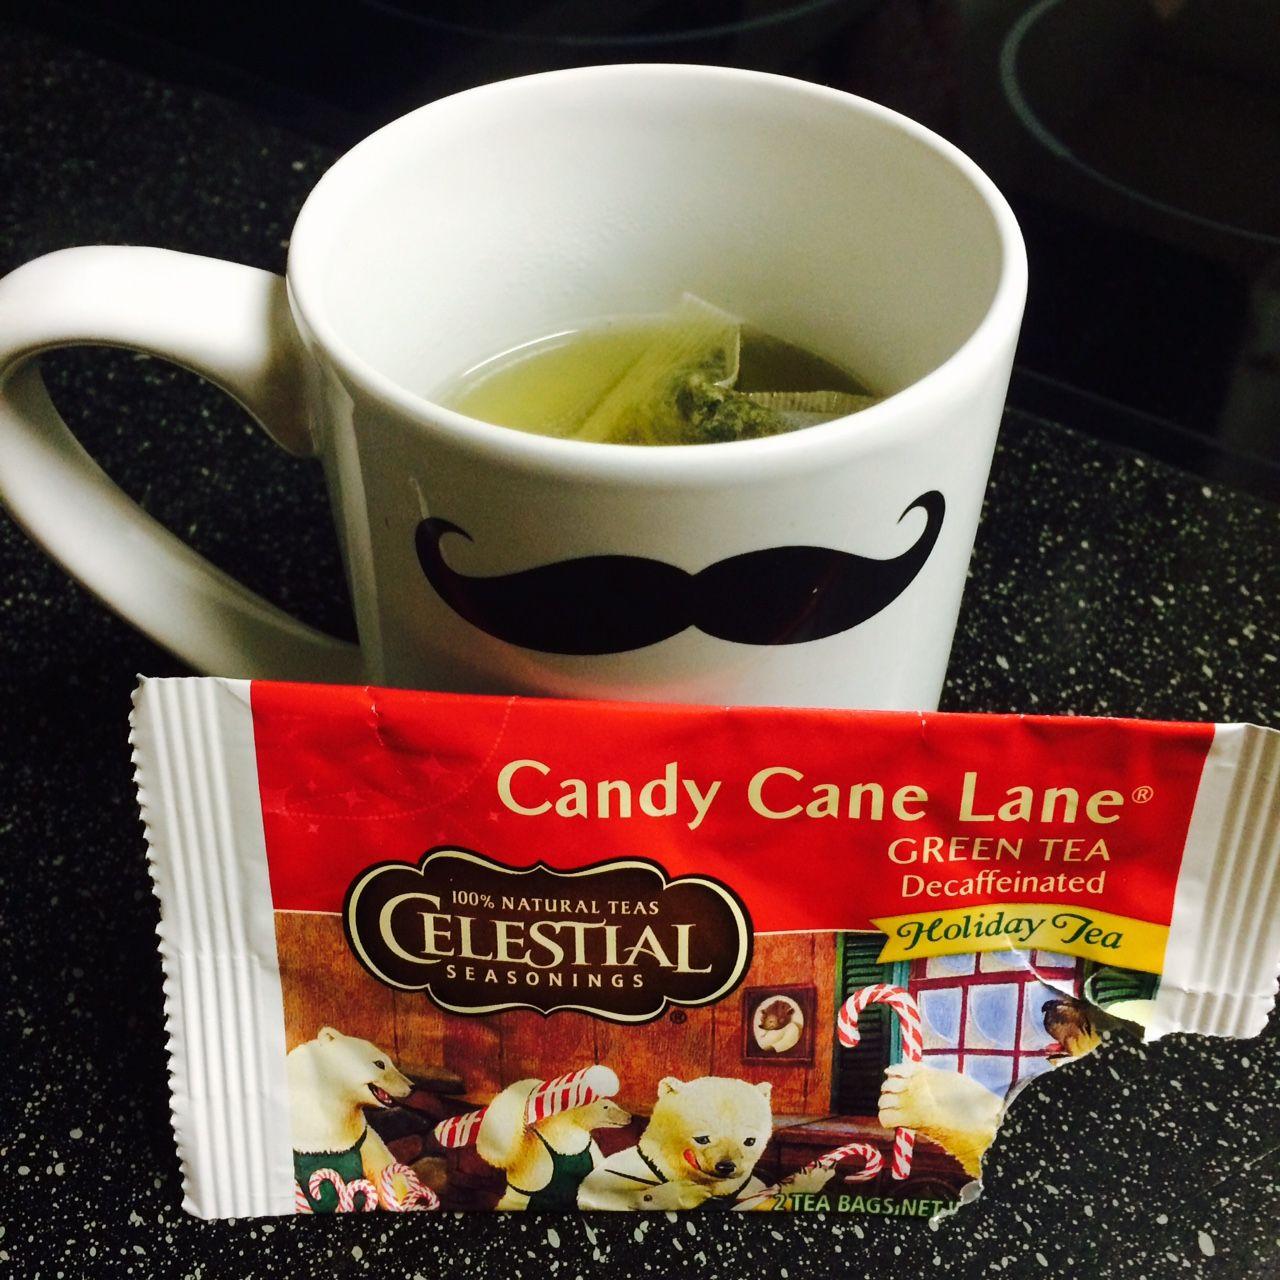 Celestial Seasonings Candy Cane Lane® Decaf Green Tea is